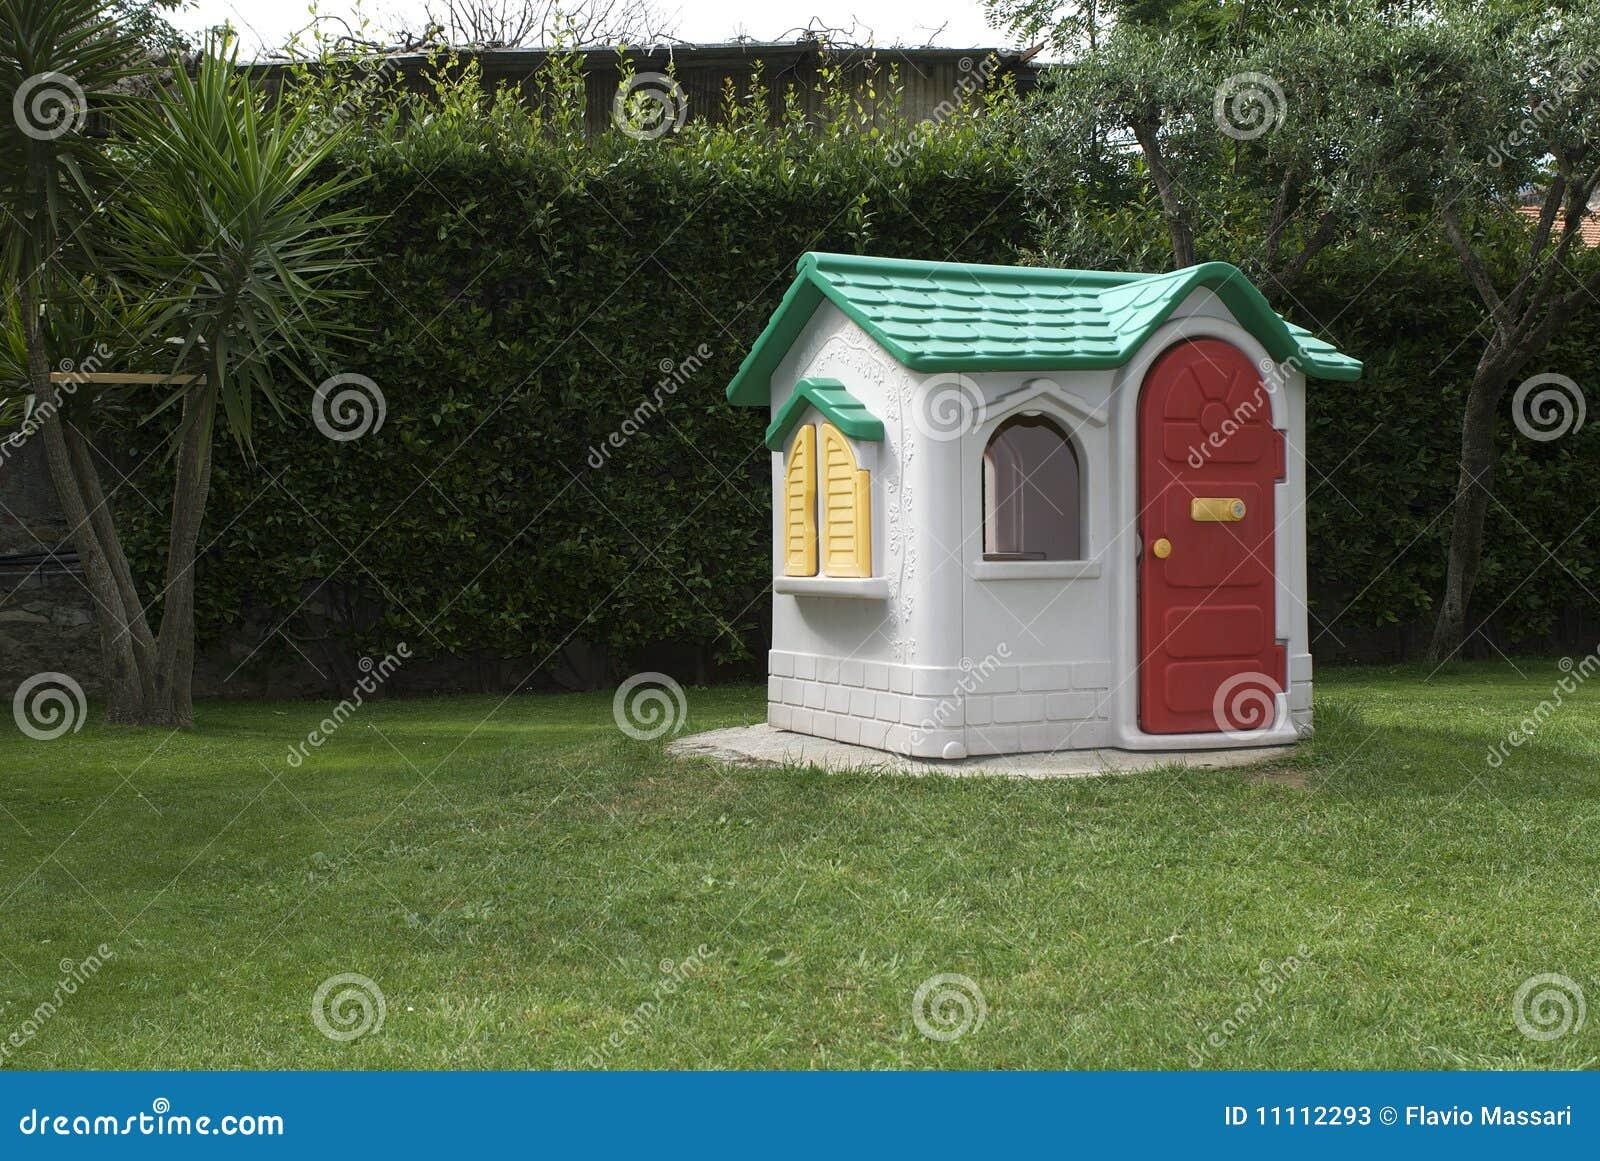 Toy House Stock Photos Image 11112293